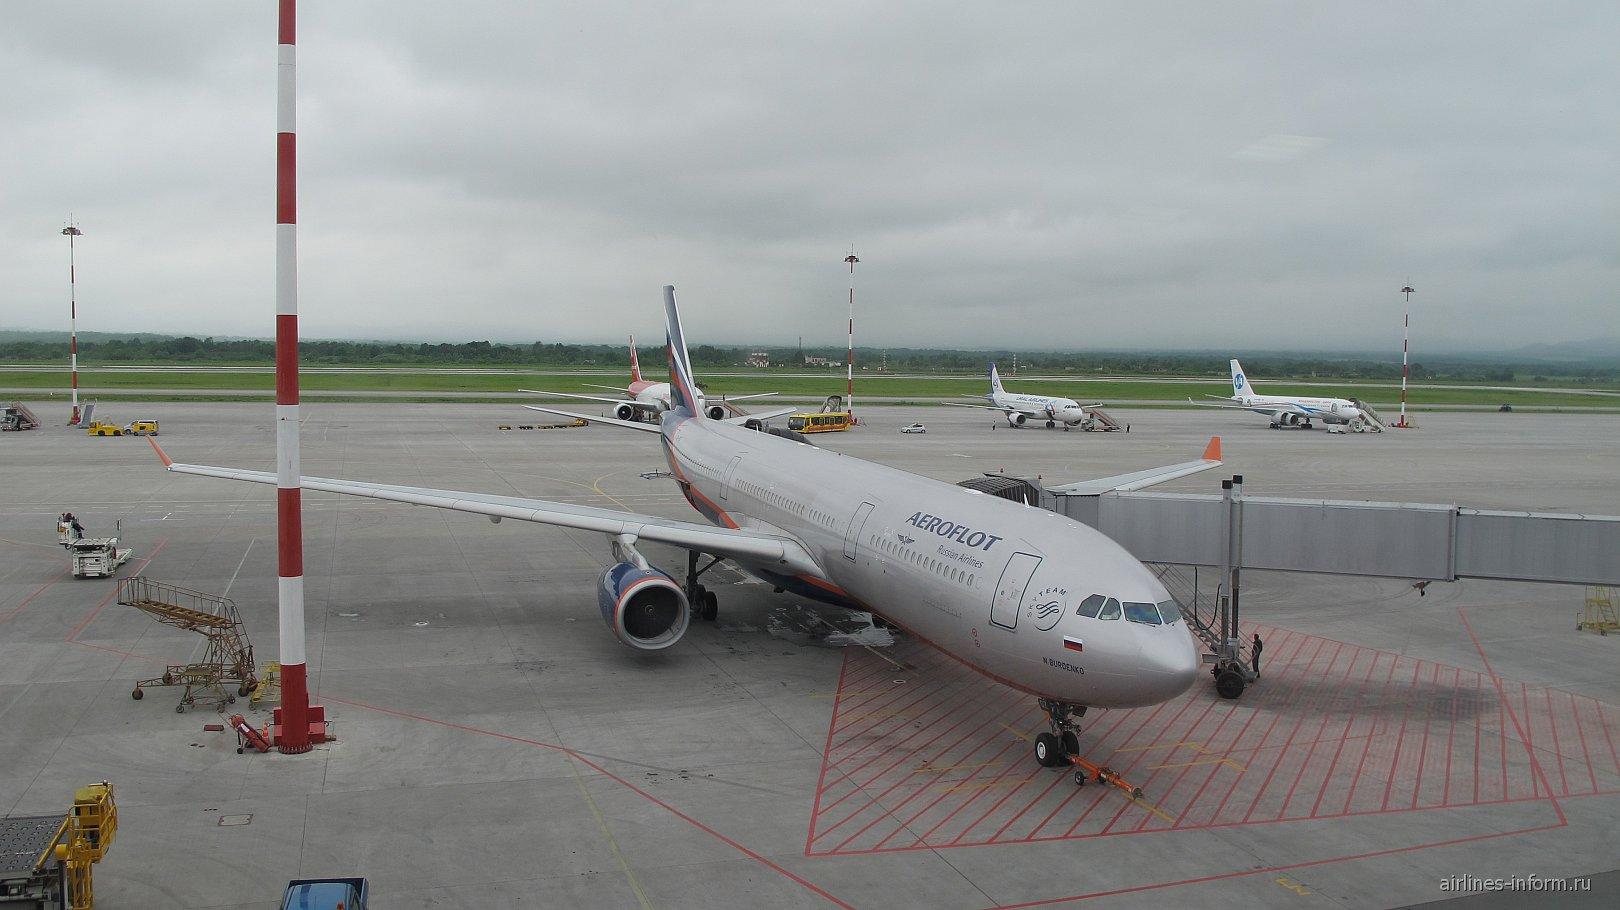 Airbus A330-300 Аэрофлота в аэропорту Владивостока